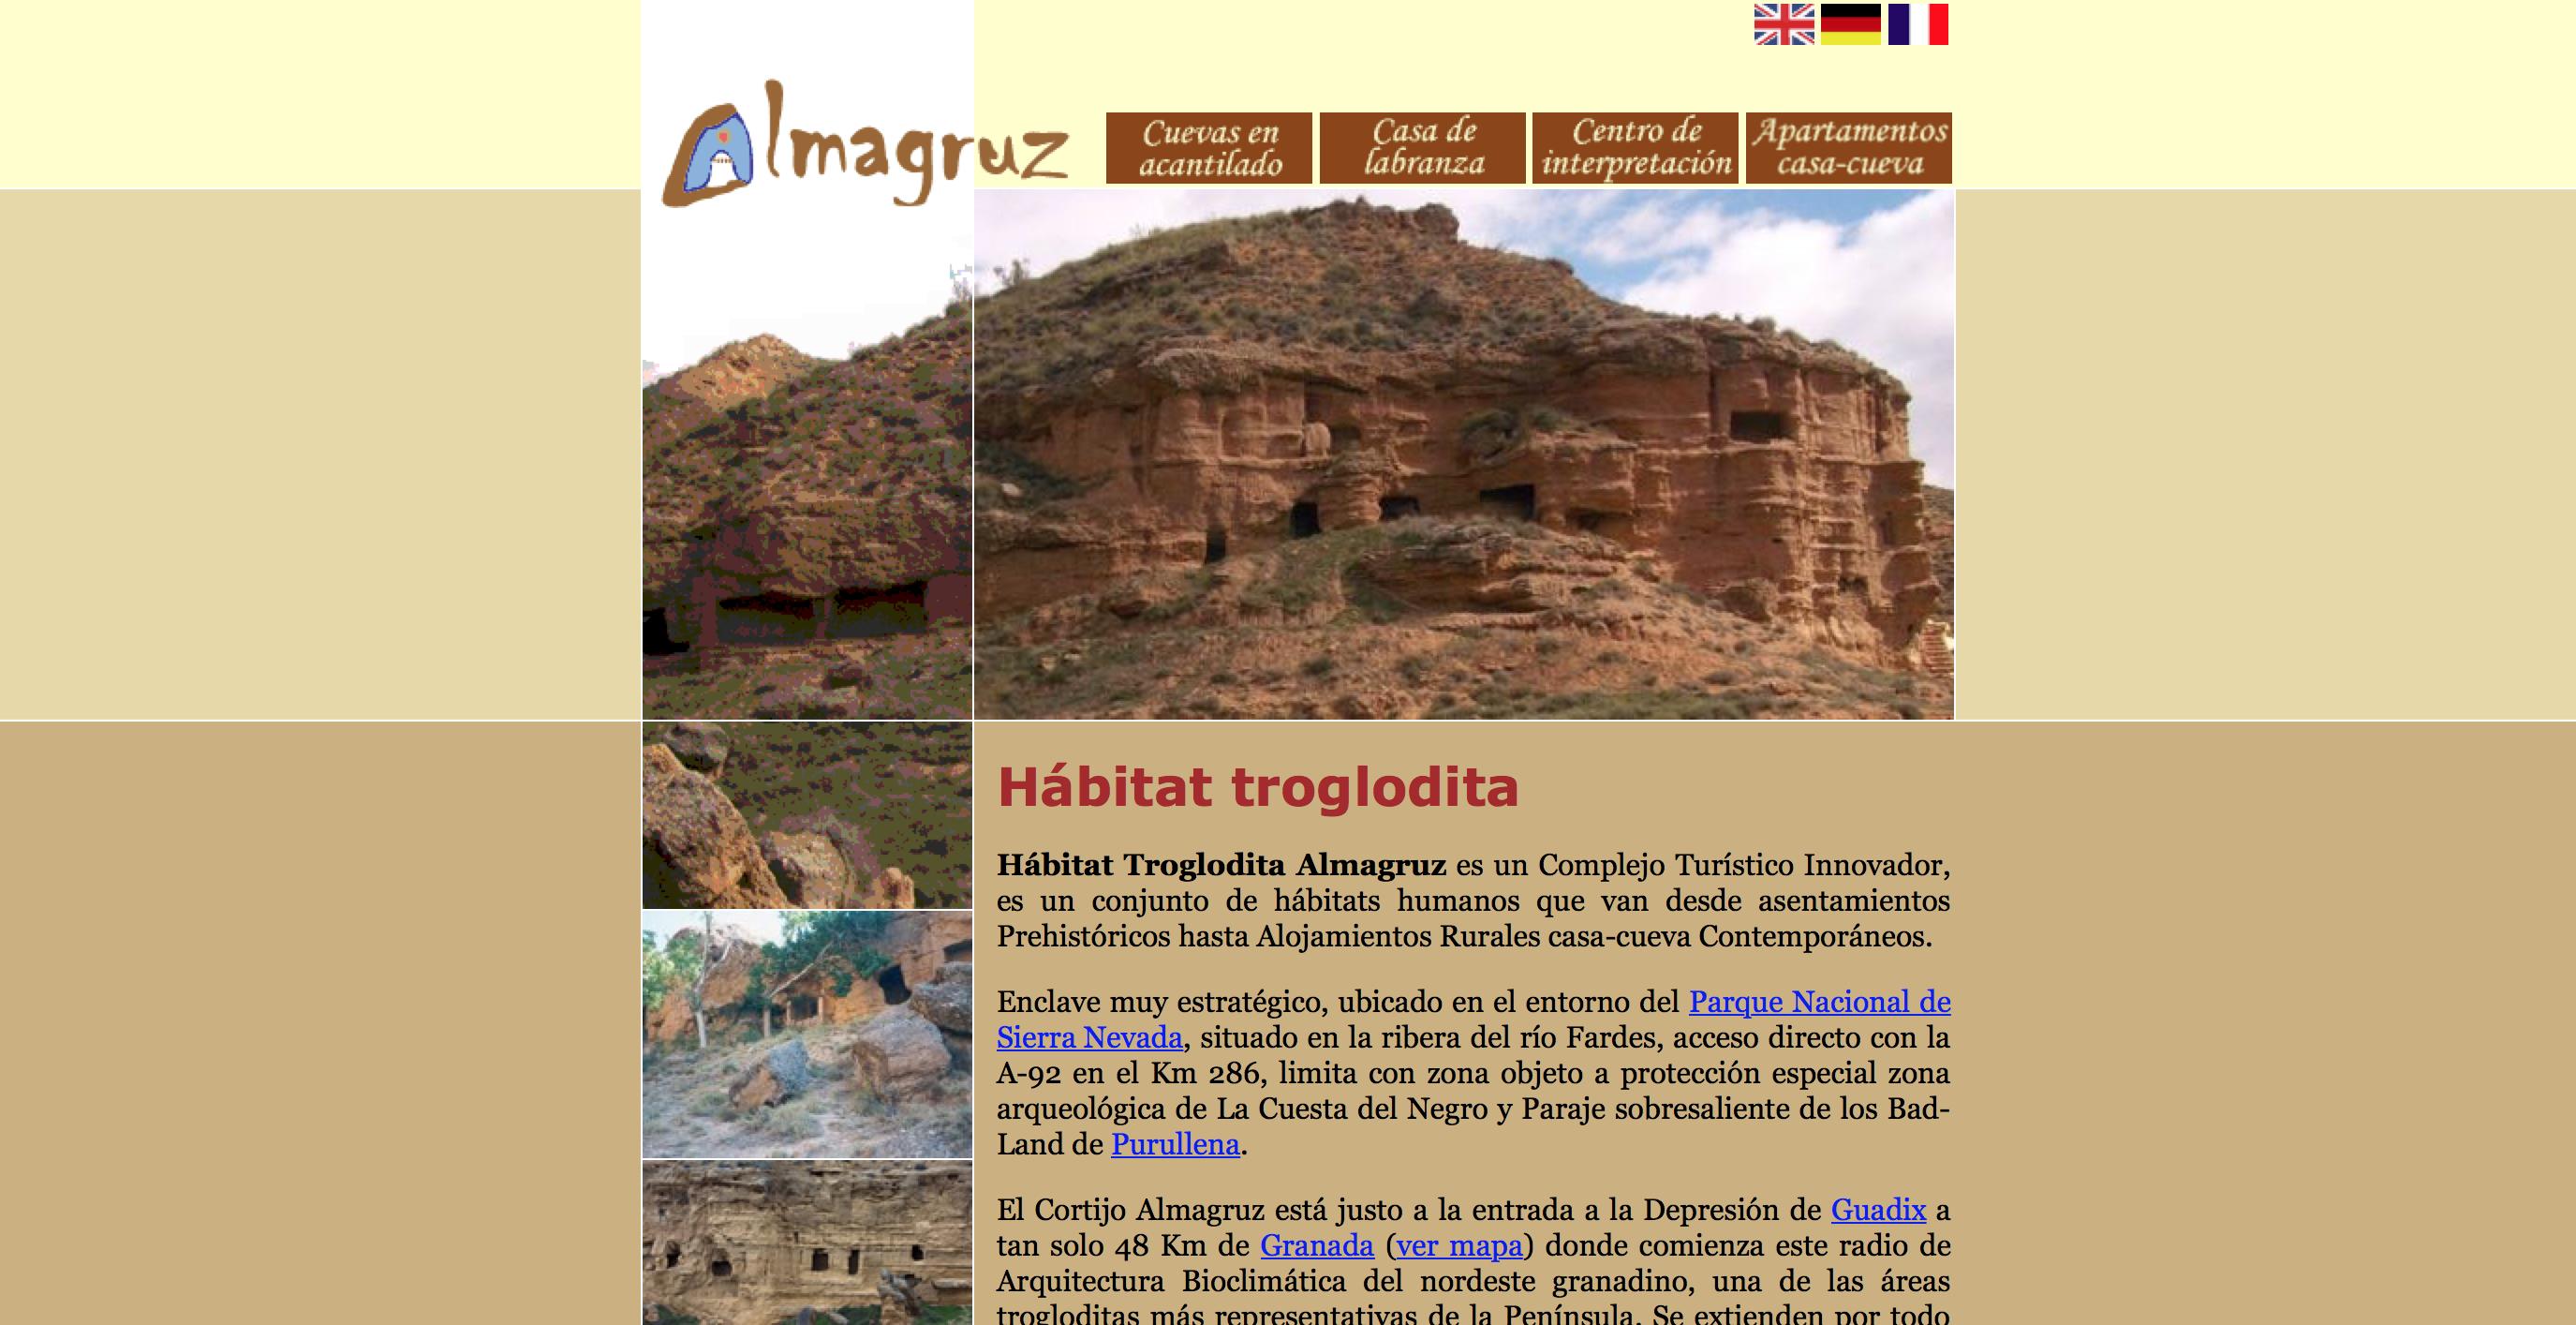 Habitat Troglodita Almagruz